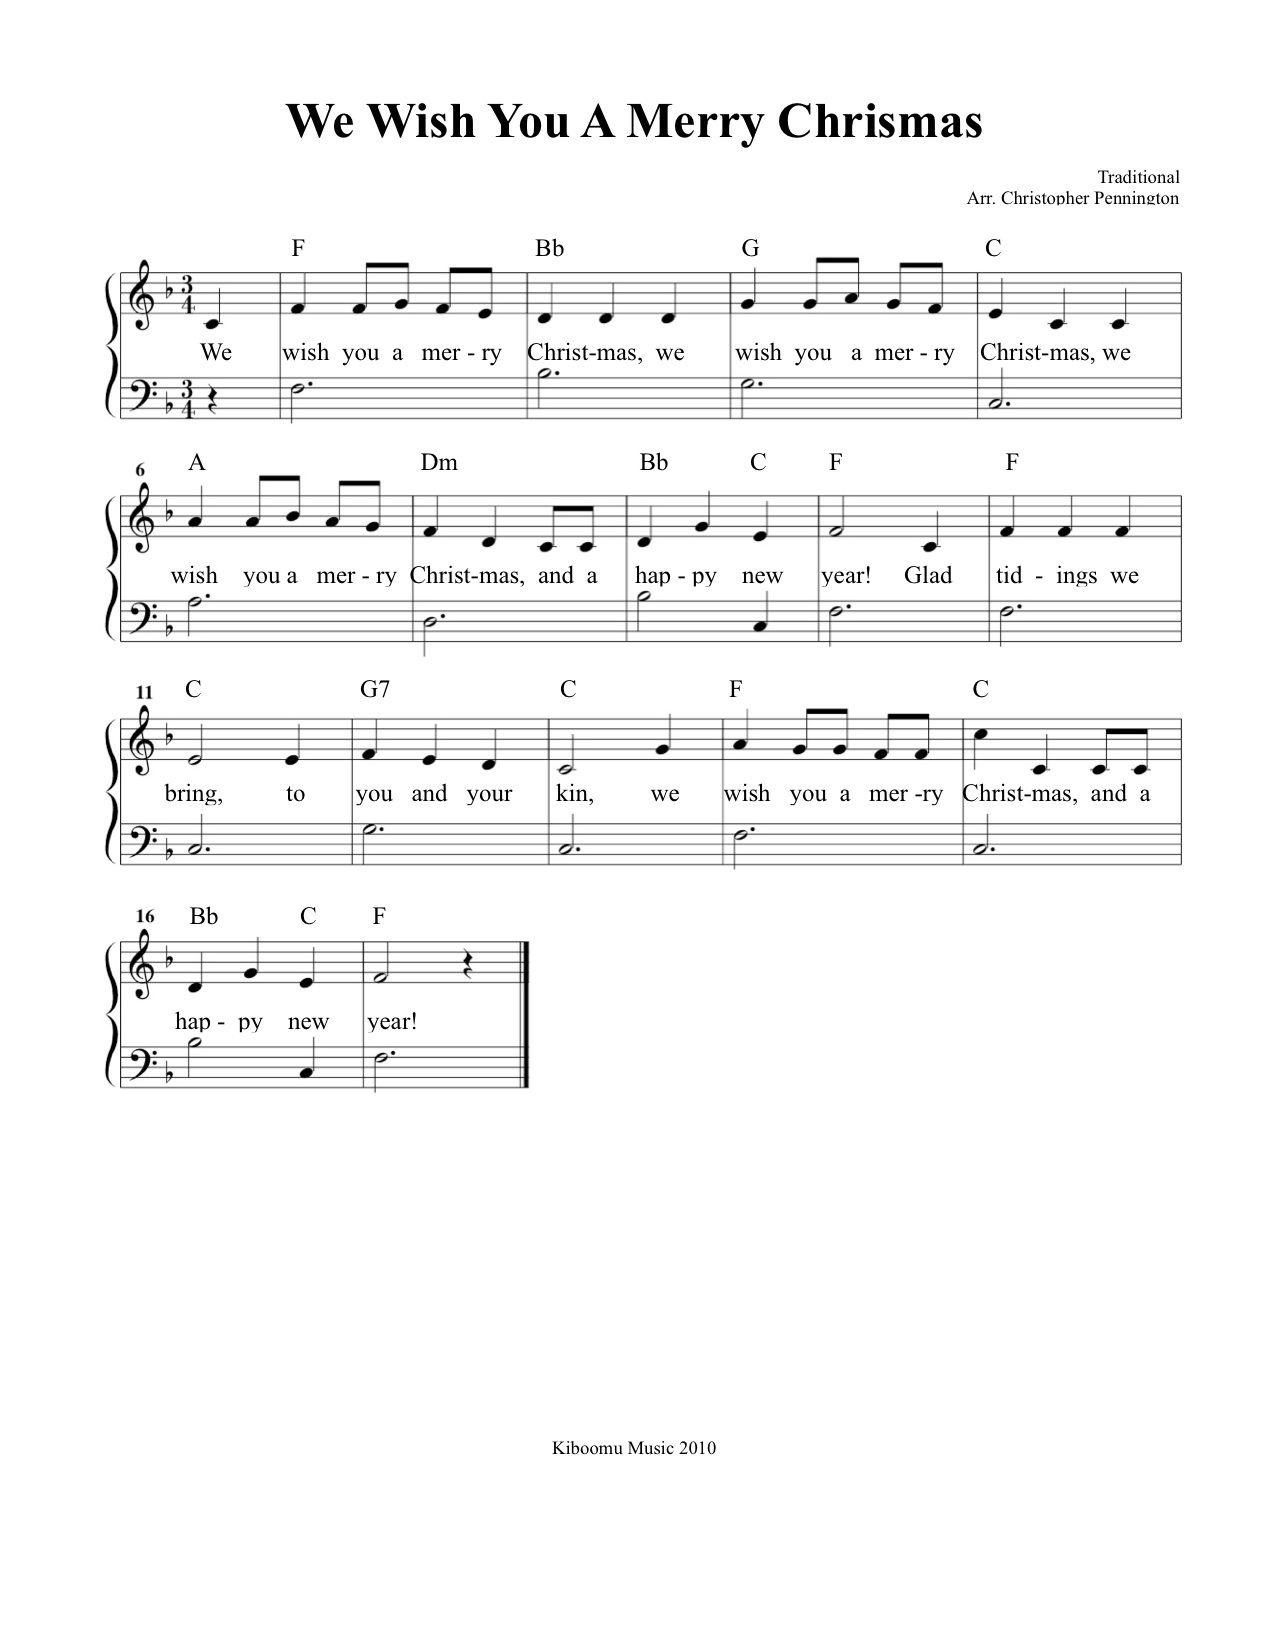 We Wish You A Merry Christmas Sheet Music And Song For Kids!   Music - Free Christmas Sheet Music For Keyboard Printable